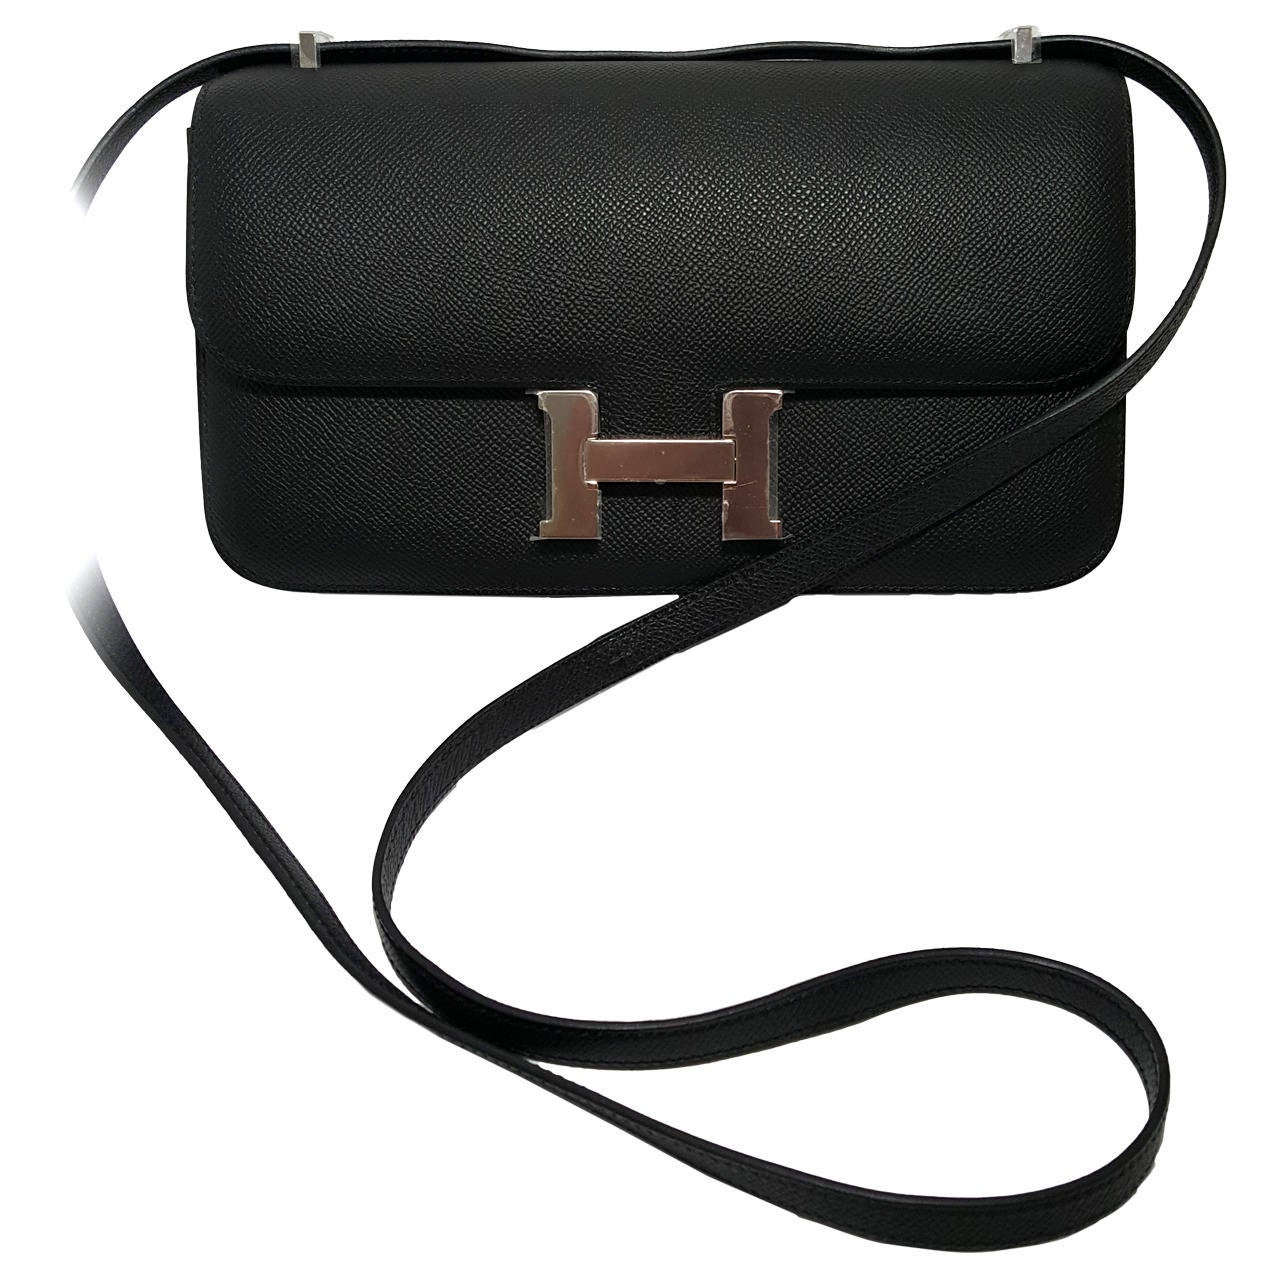 HERMES Constance Elan 25 cm Bag Black Epsom Leather w/ palladium ...